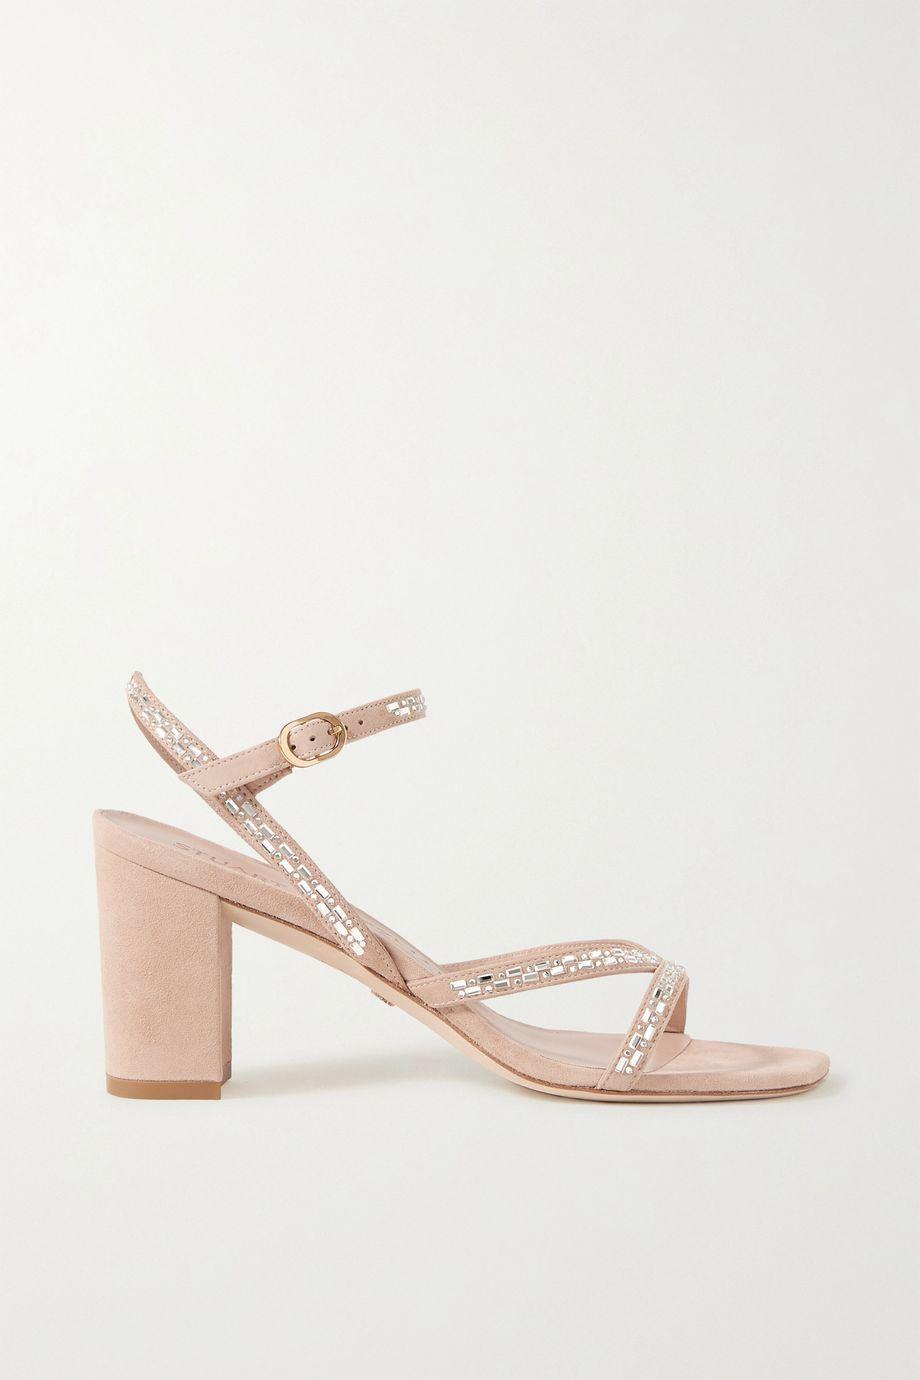 Stuart Weitzman Harlowe crystal-embellished suede sandals